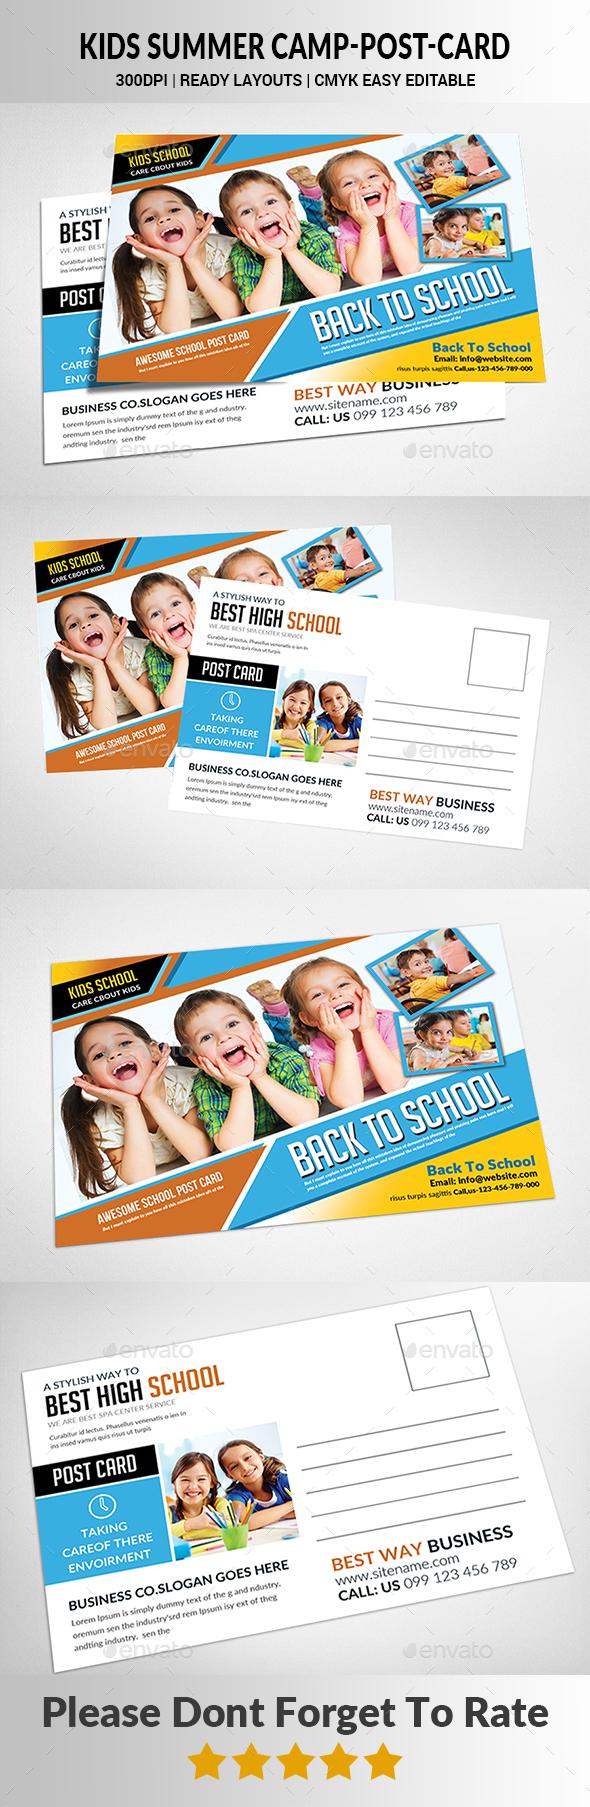 Kids Summer Camp Postcard - Cards & Invites Print Templates